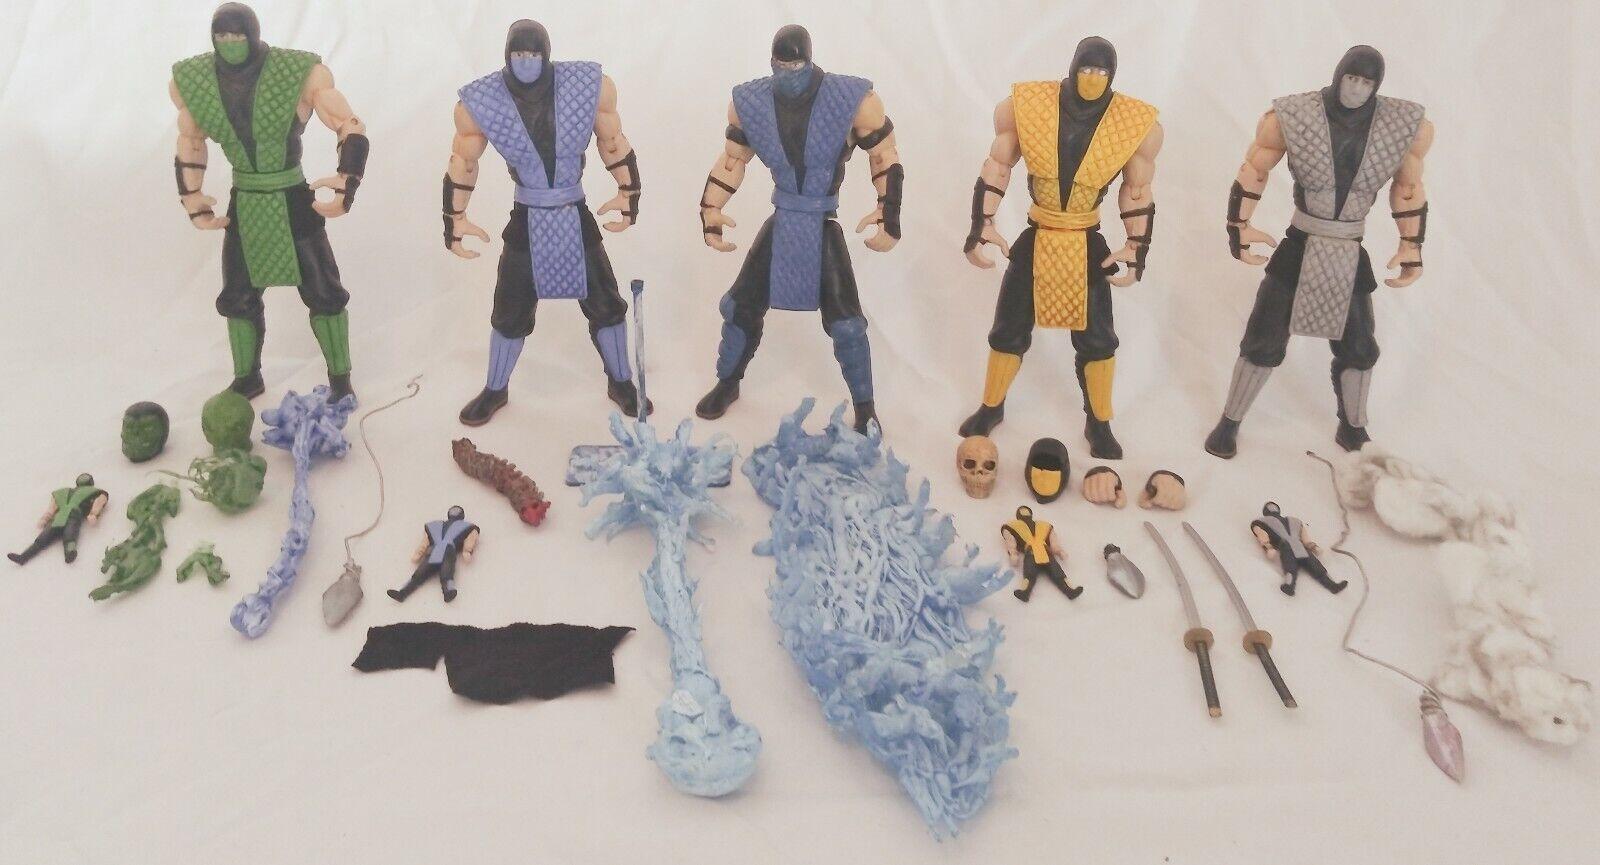 Mortal Kombat Retro 6 Inch Action Figure 4pack Scorpion Reptile